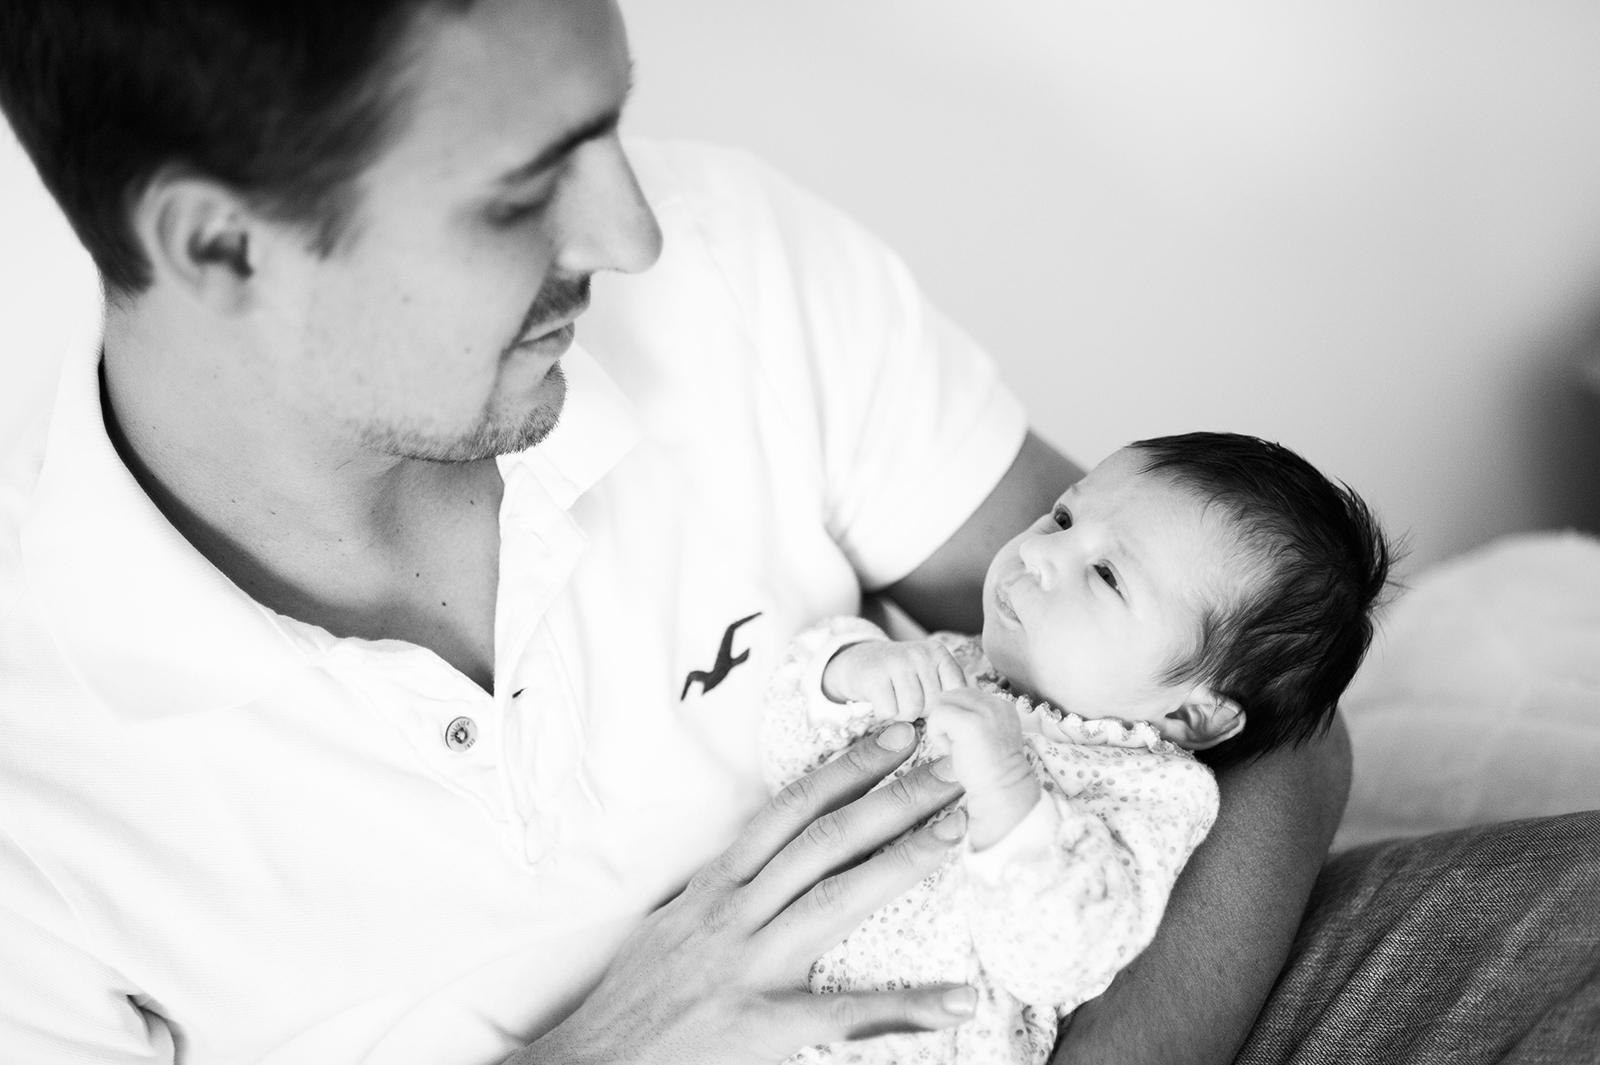 seance-photo-famille-photo-grossesse-photo-bébé-naissance-sabrina-godemert-photographe-seine-et-marne031